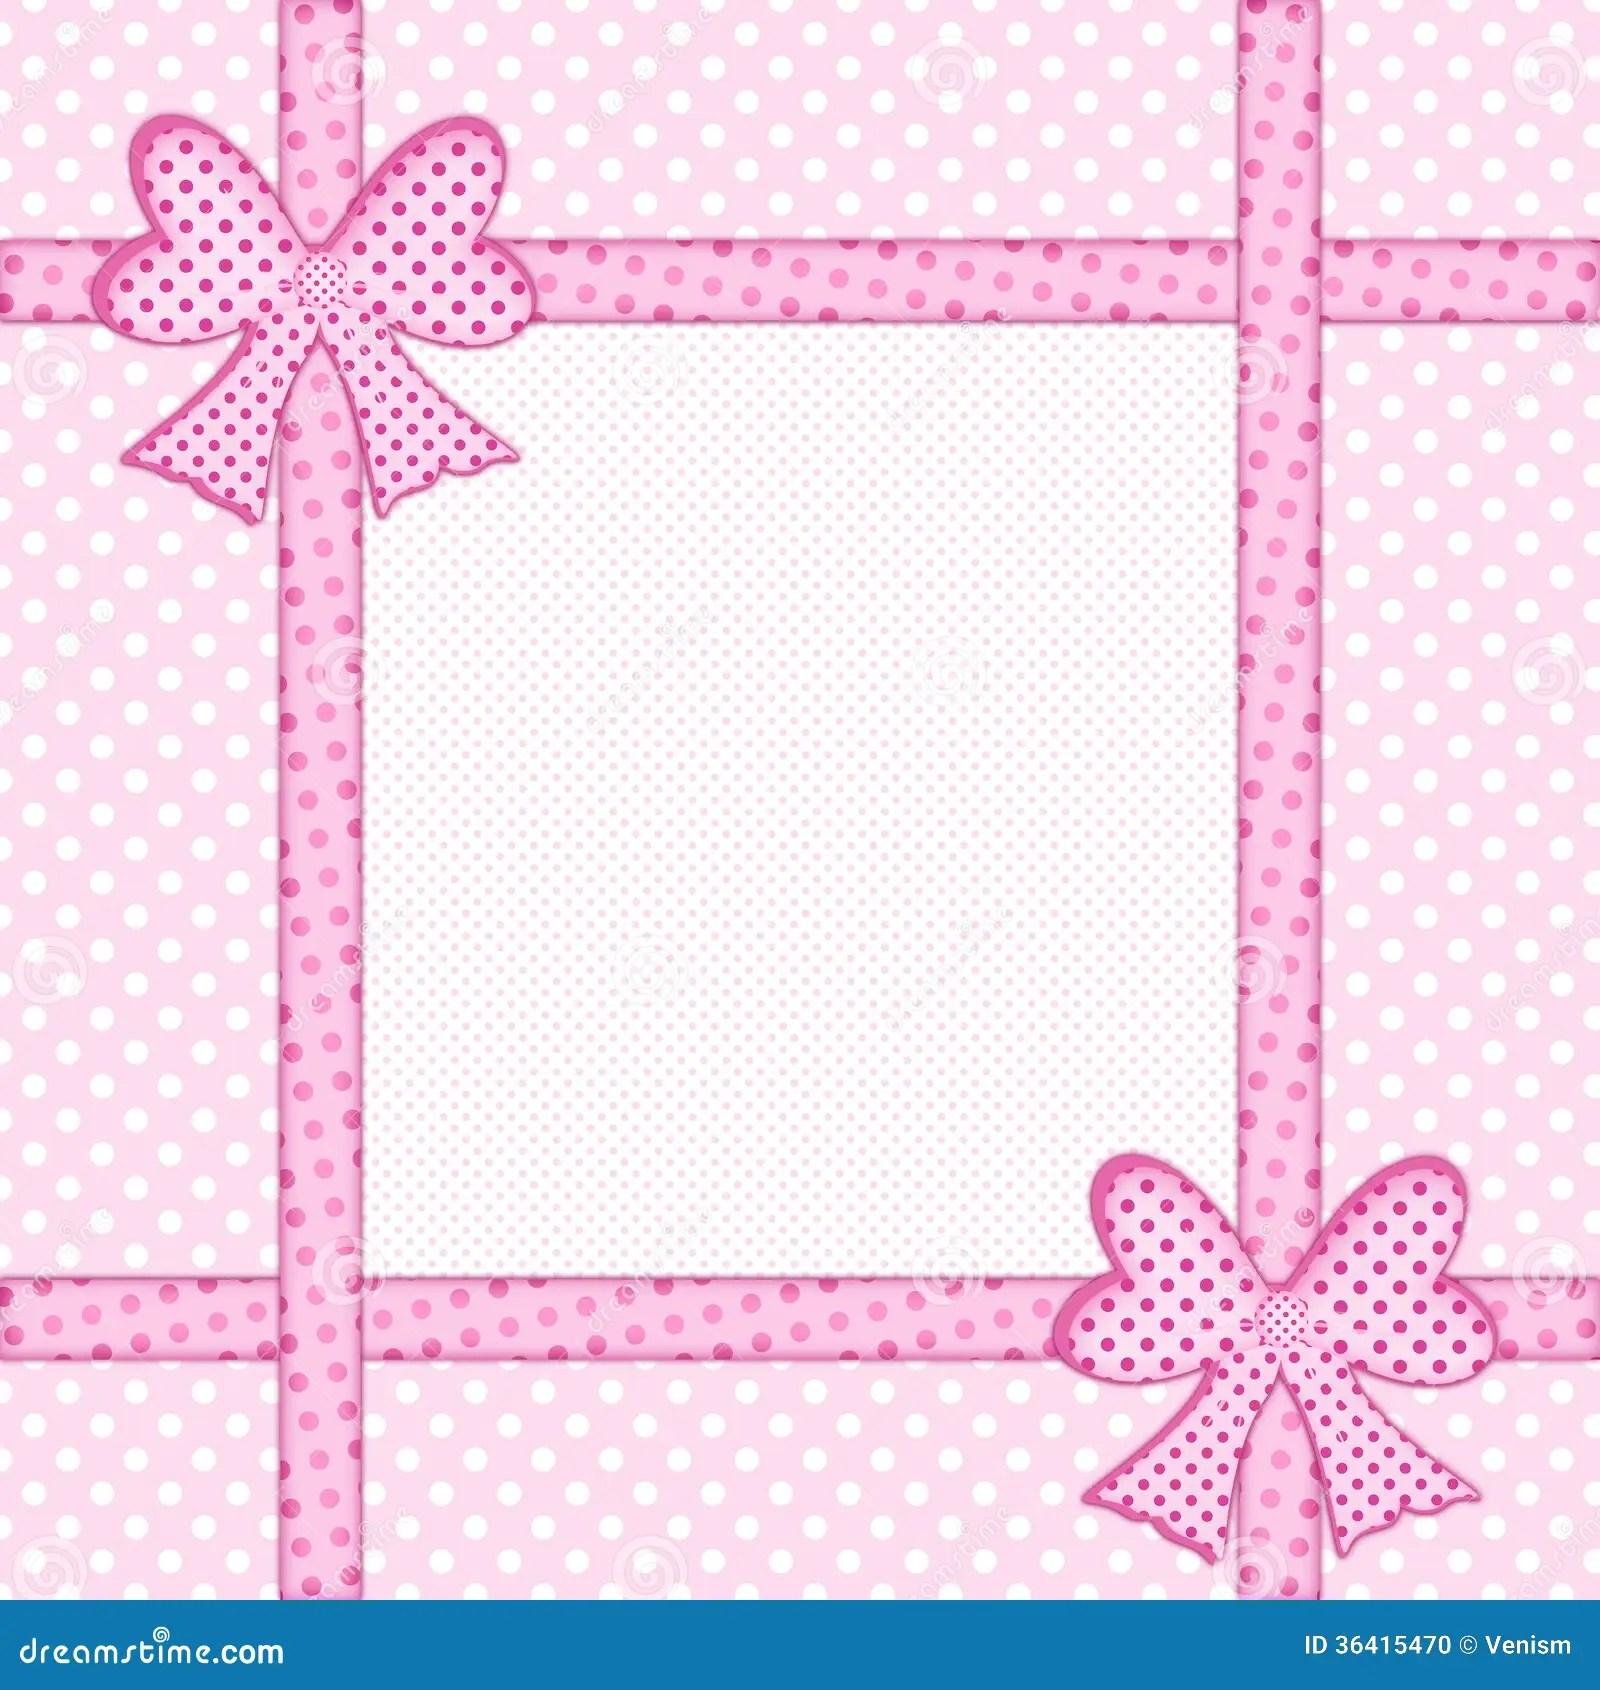 Black And White Polka Dot Wallpaper Border Pink Polka Dot Background With Gift Bows And Ribbons Stock